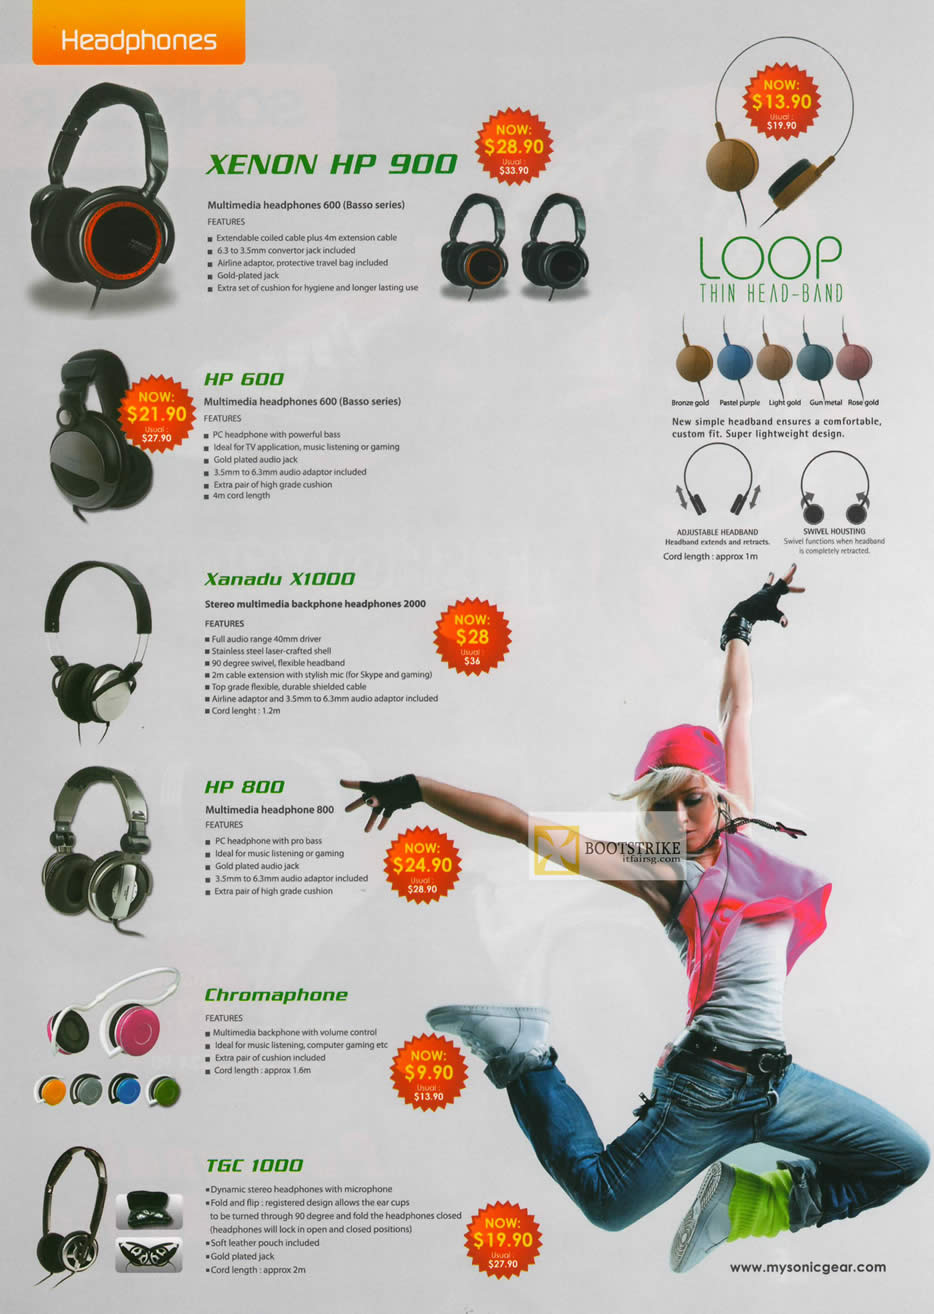 IT SHOW 2012 price list image brochure of Leap Frog Sonicgear Headphones Xenon HP 900, HP 600, Xanadu X1000, Chromaphone, TGC 1000